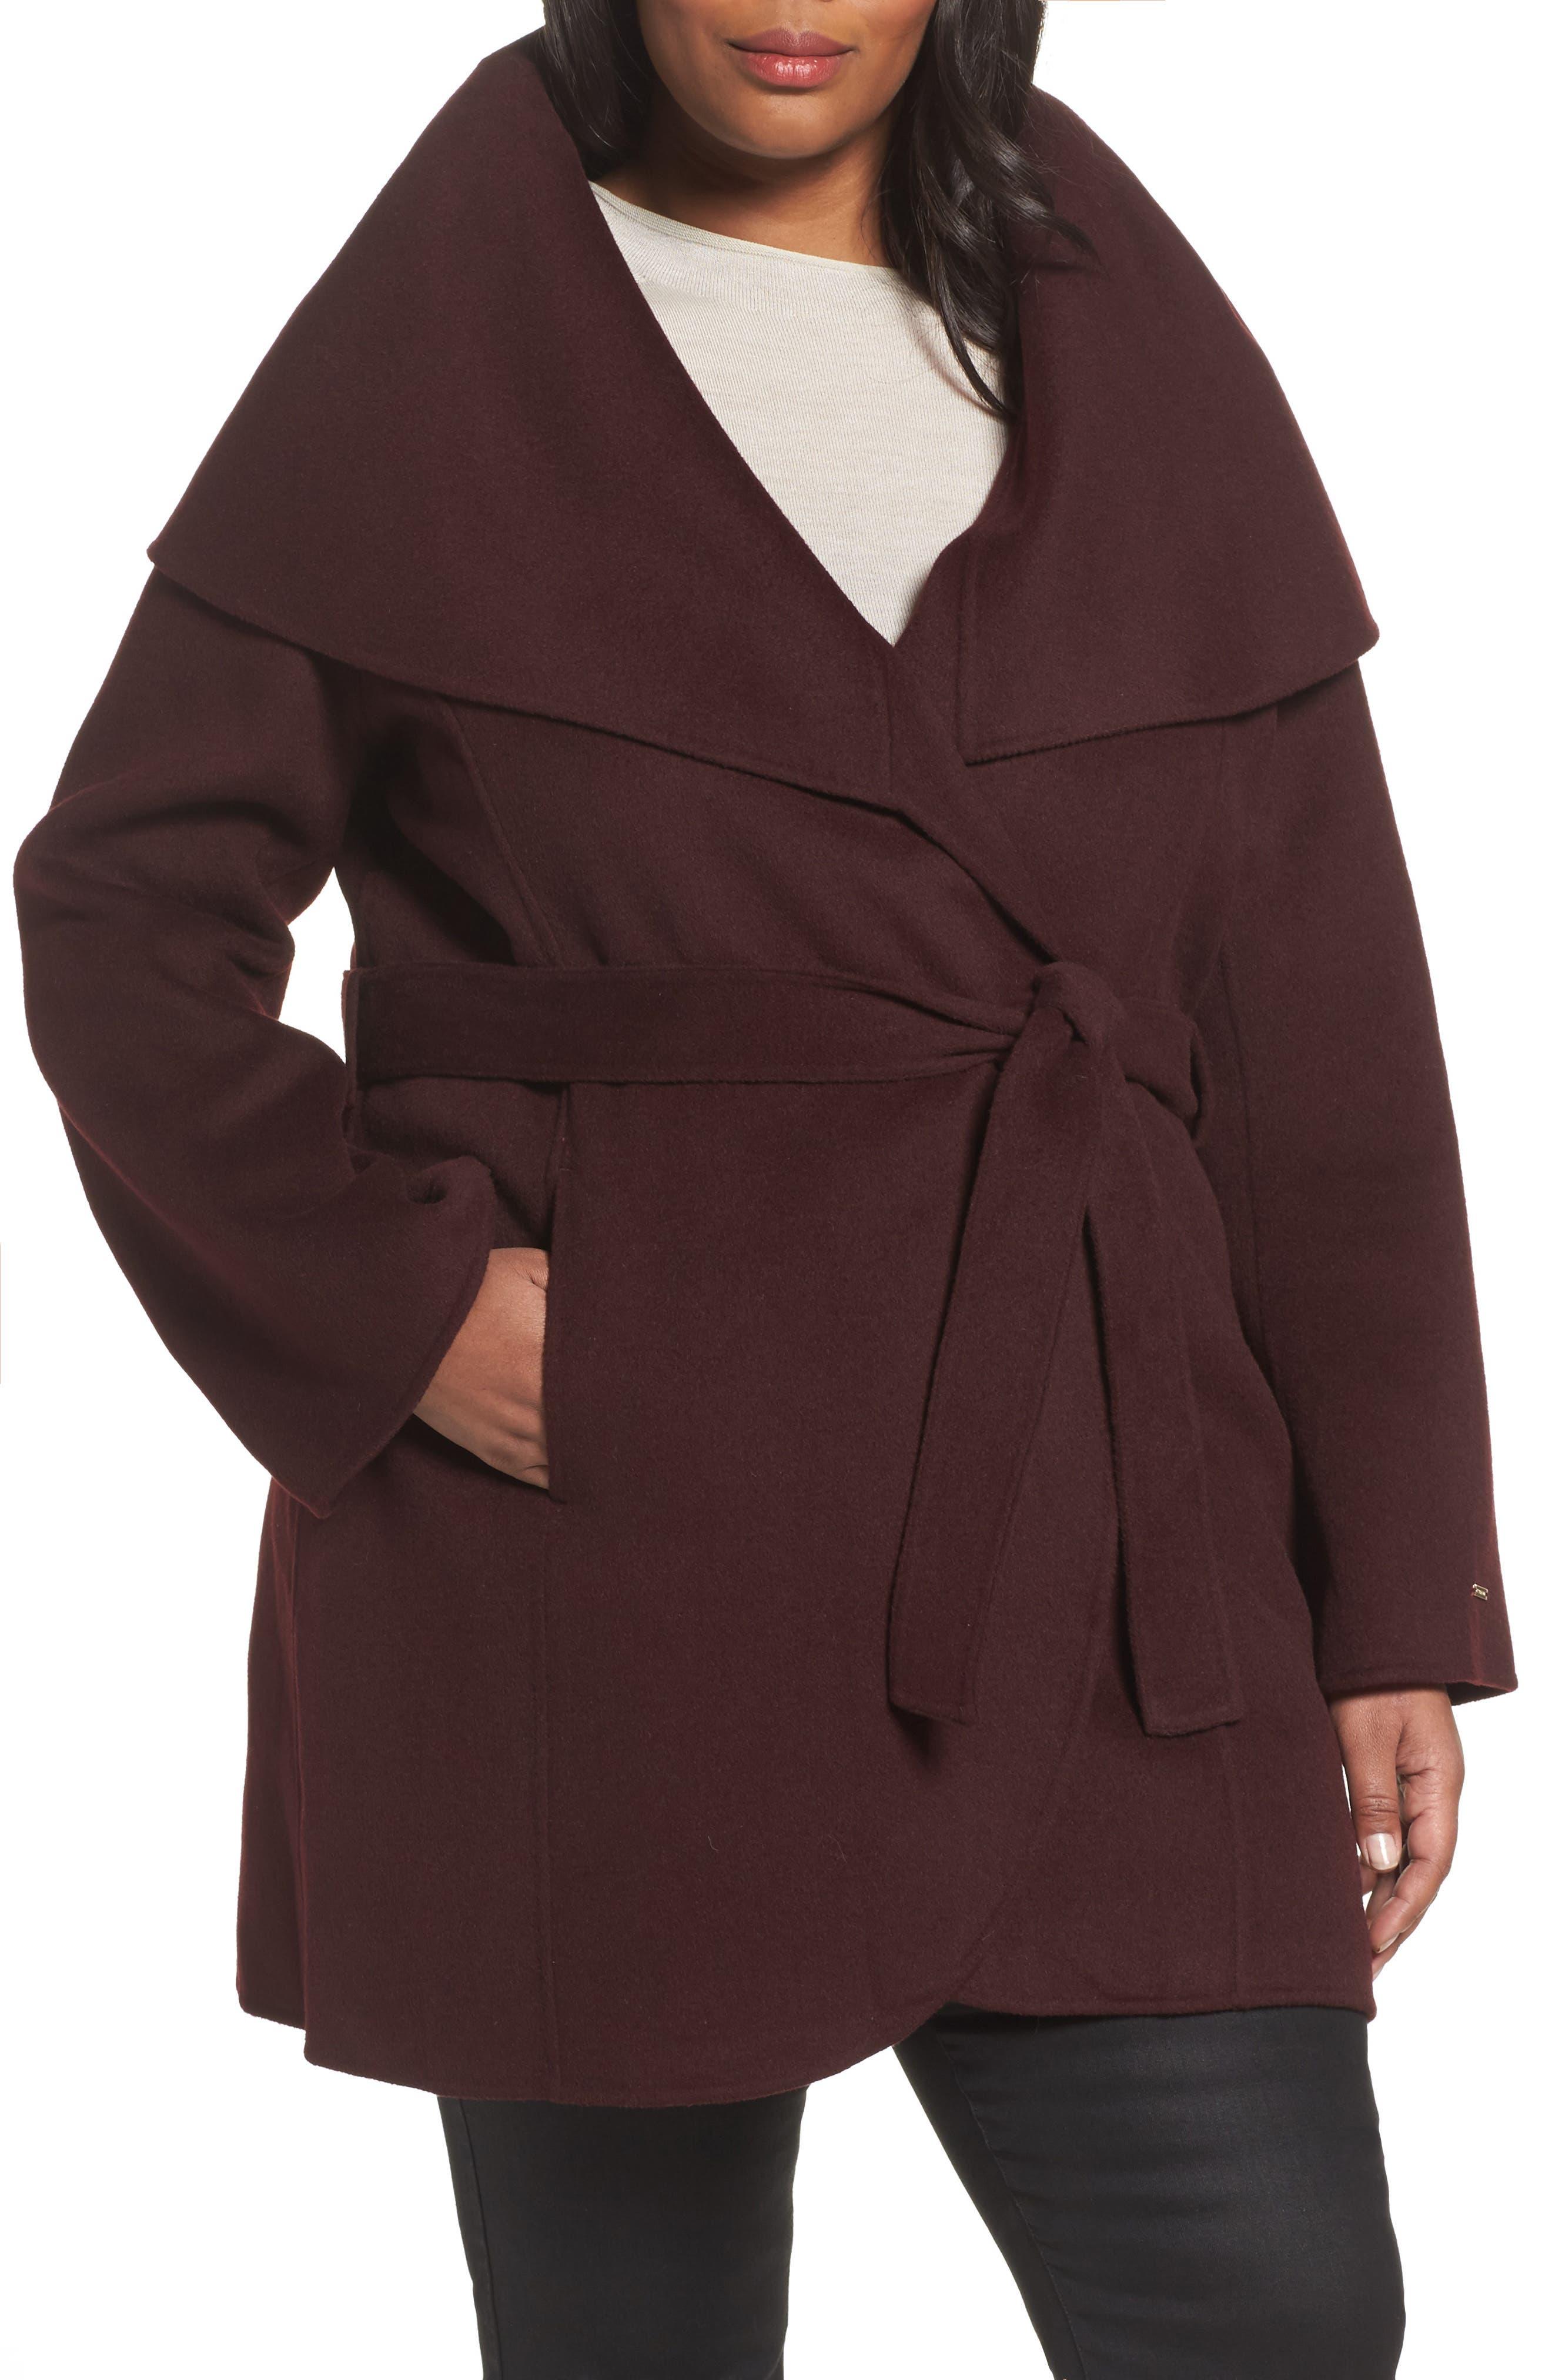 Alternate Image 1 Selected - Tahari Maria Double Face Wool Blend Wrap Coat (Plus Size)